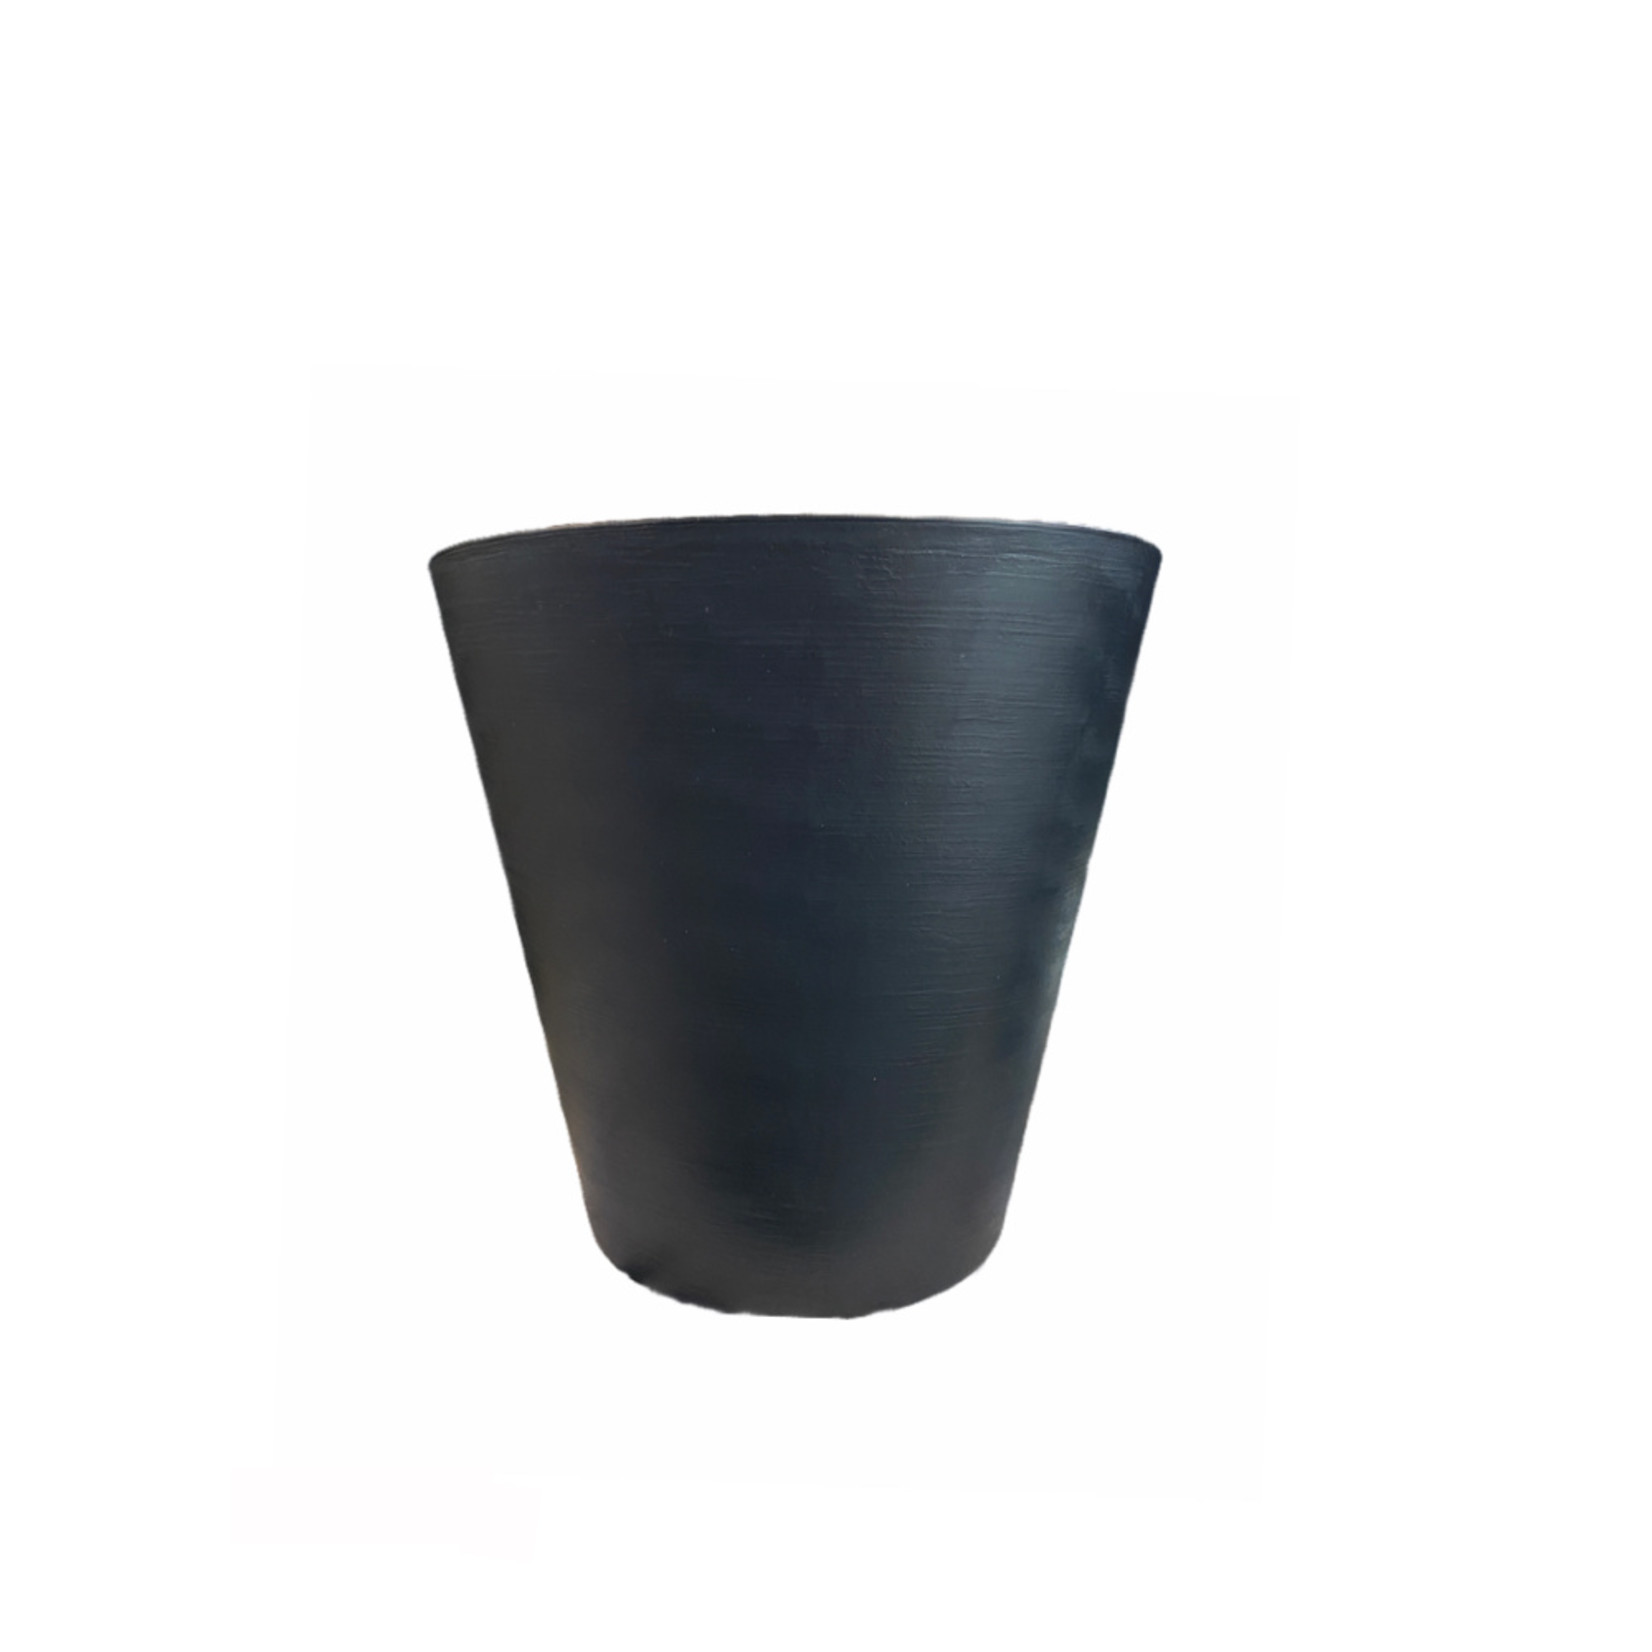 Teraplast Repot Hoop Black 30cm